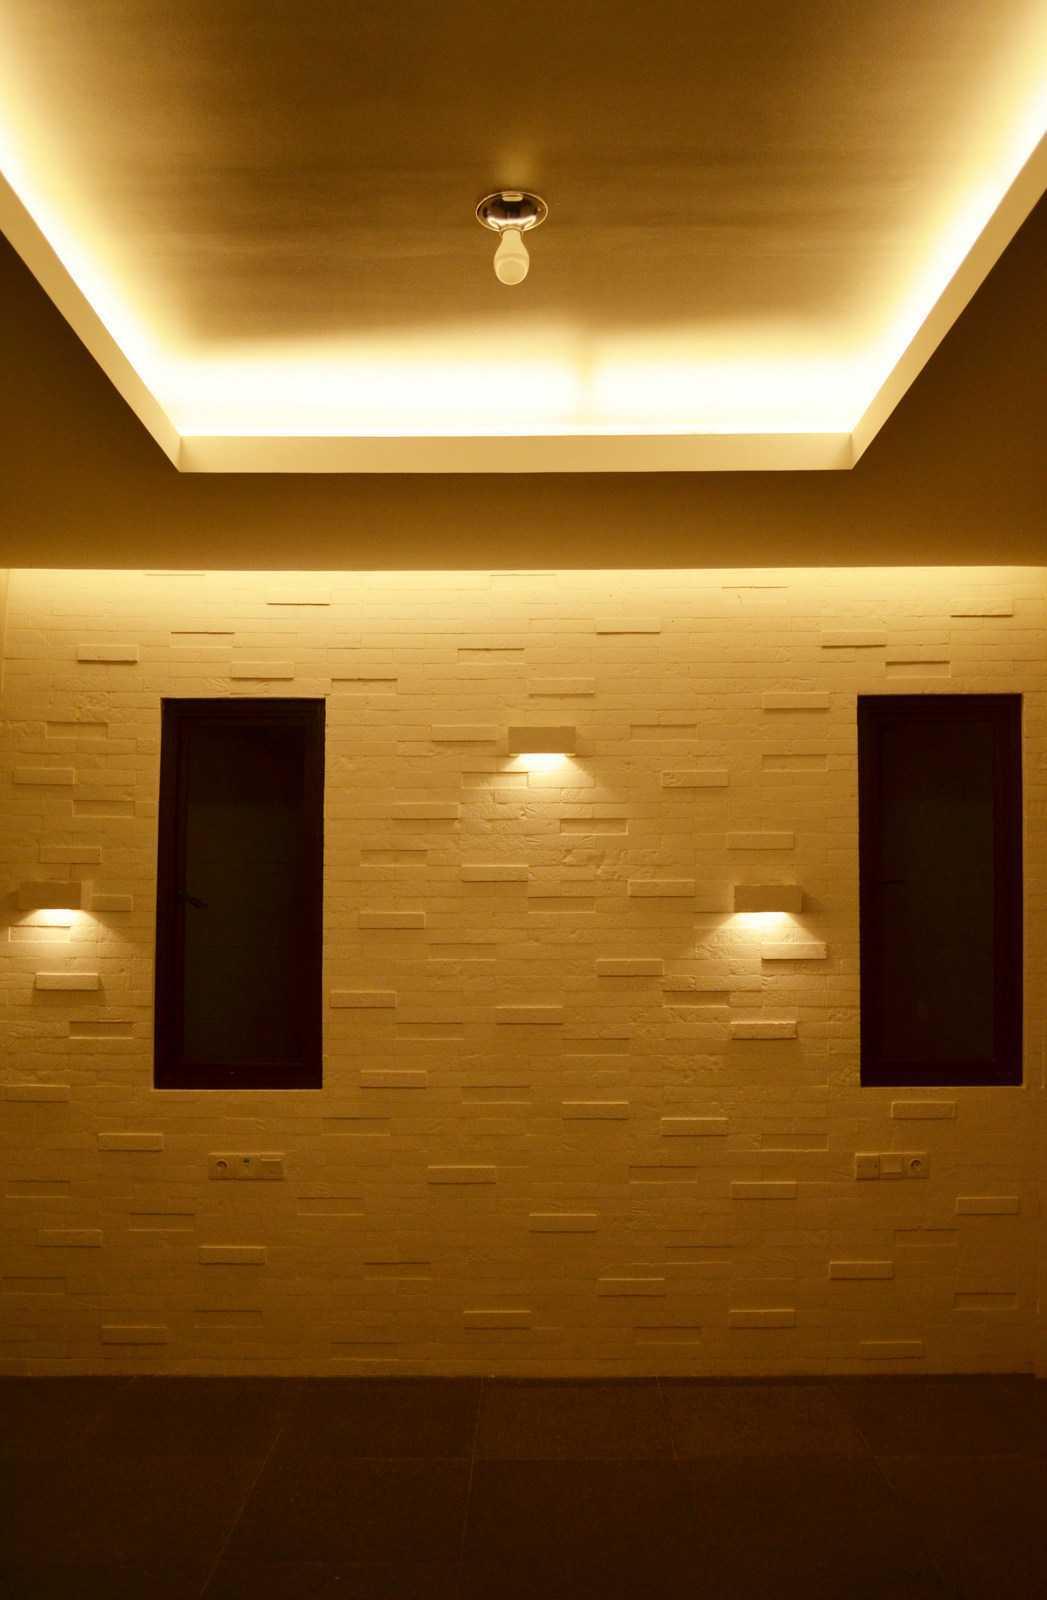 X3M Architects Nittaya A3 15 House Bsd Bsd Interior - Wall   25299